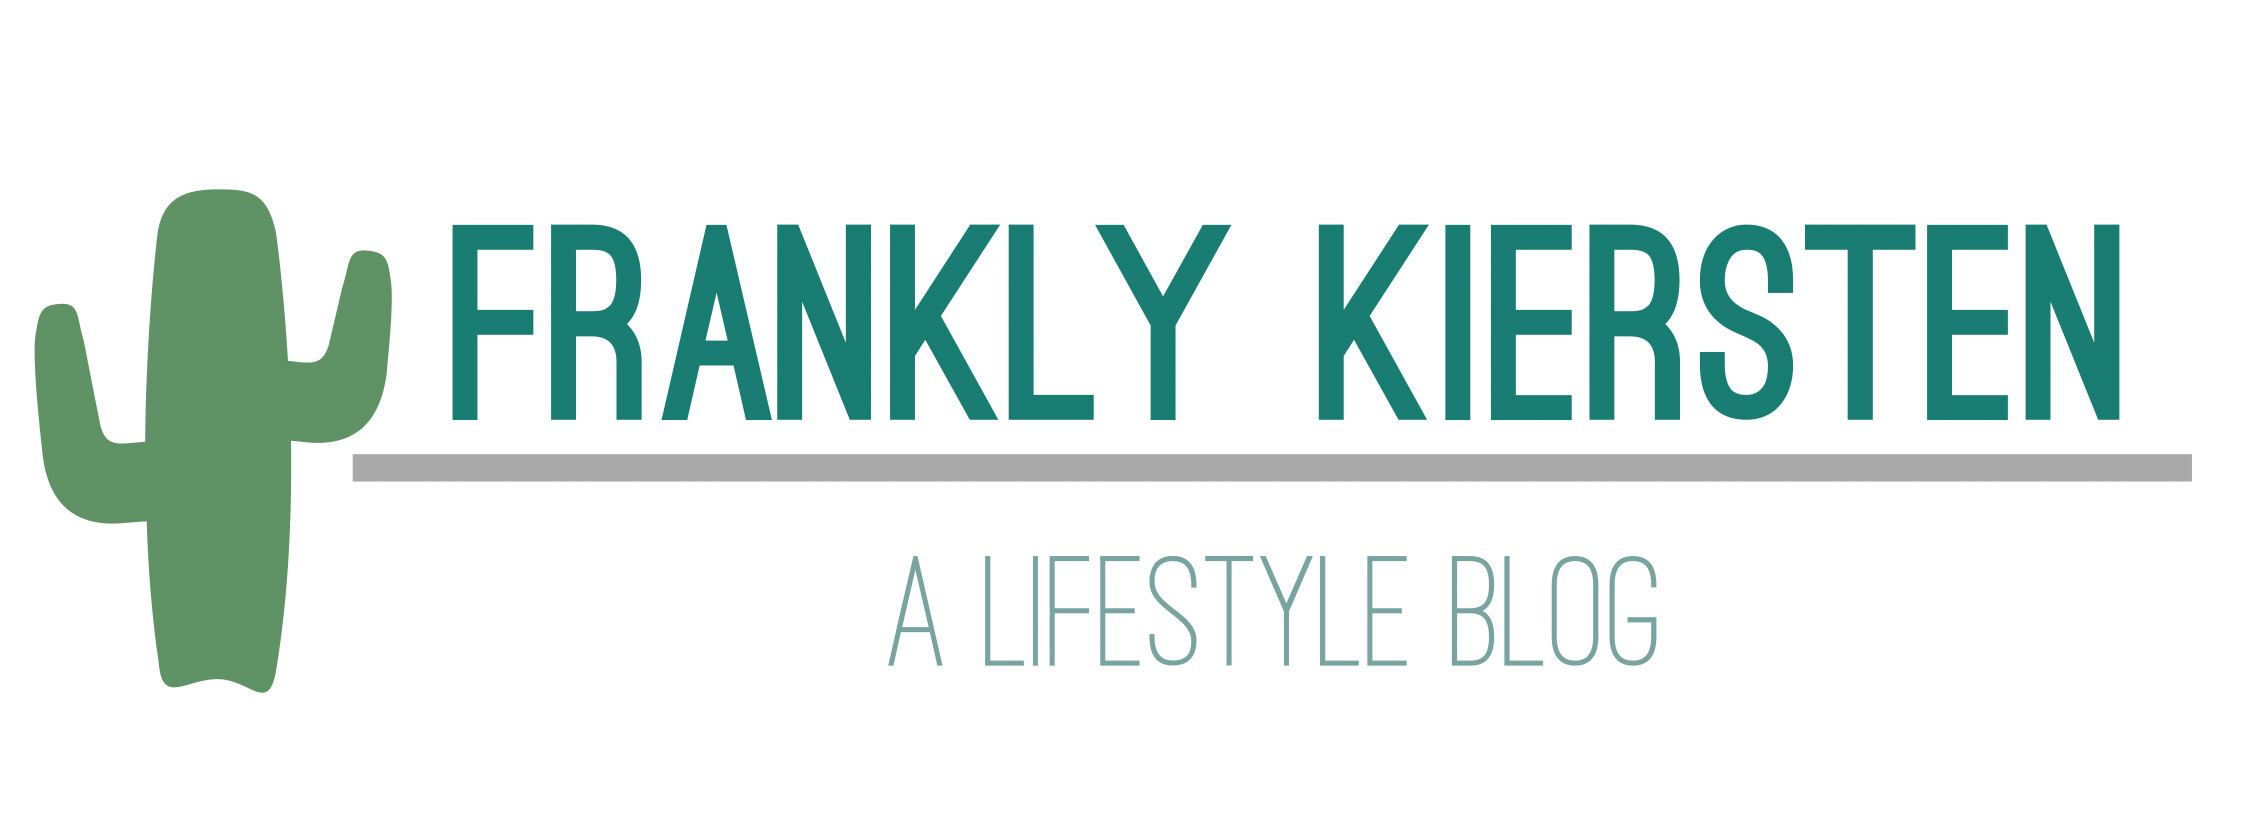 logo from Franklykiersten.com